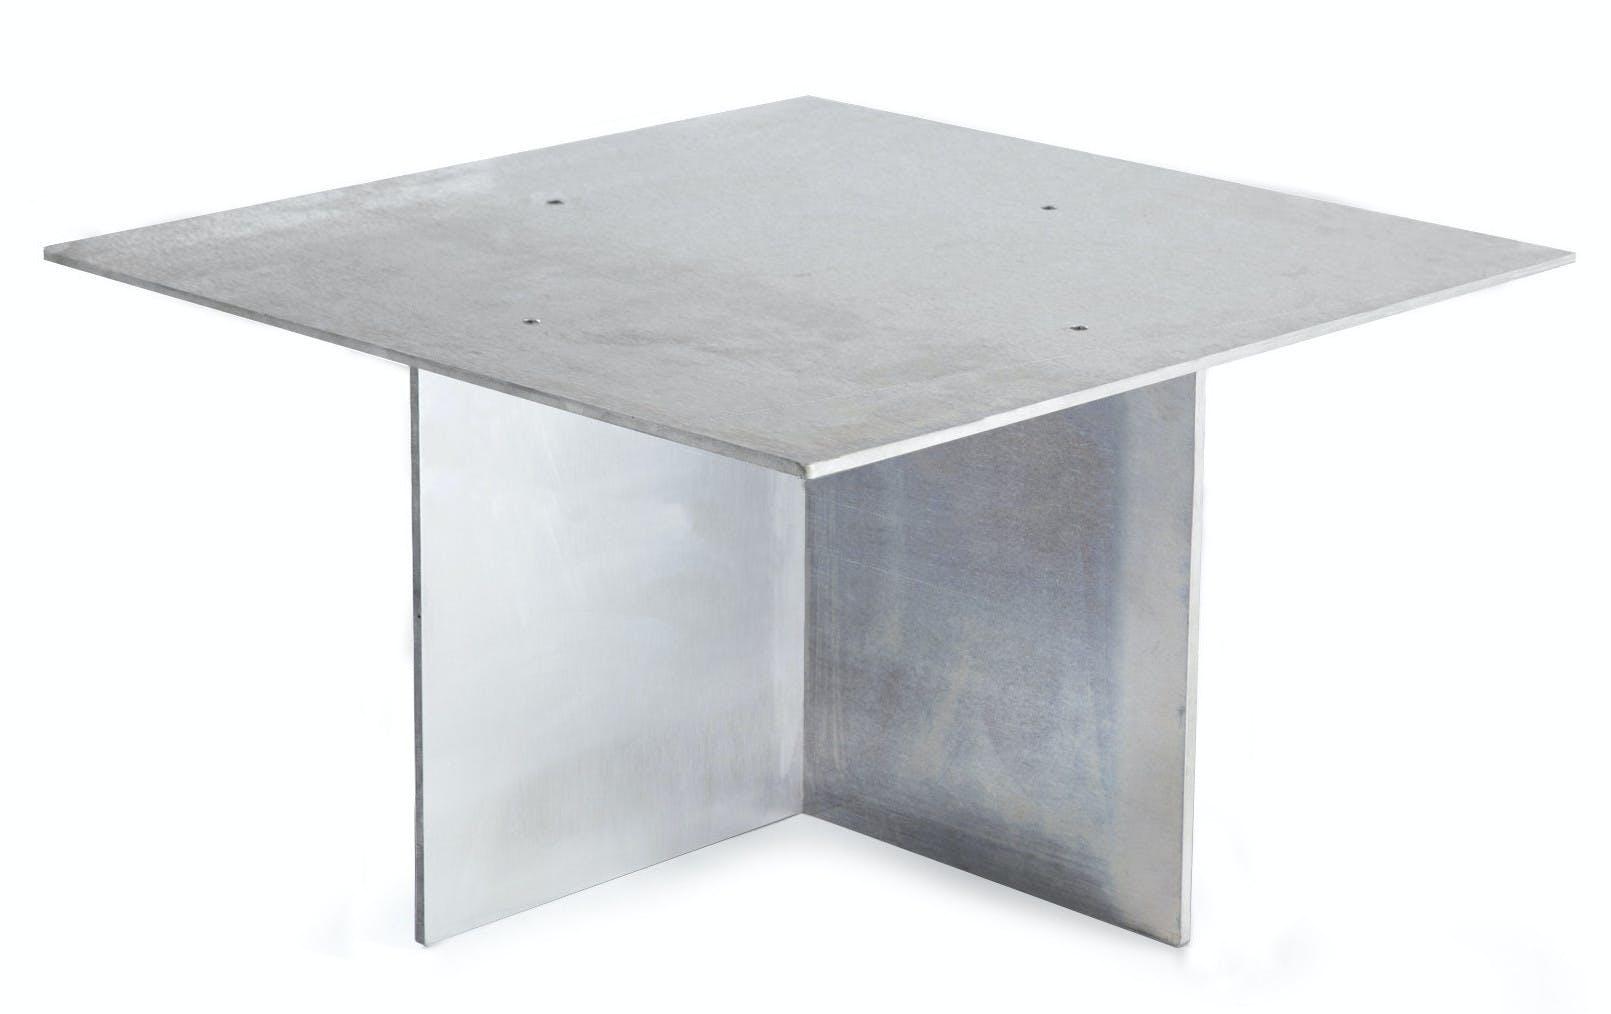 Deadgood-aluminum-table-coffee-haute-living_190226_174046_1